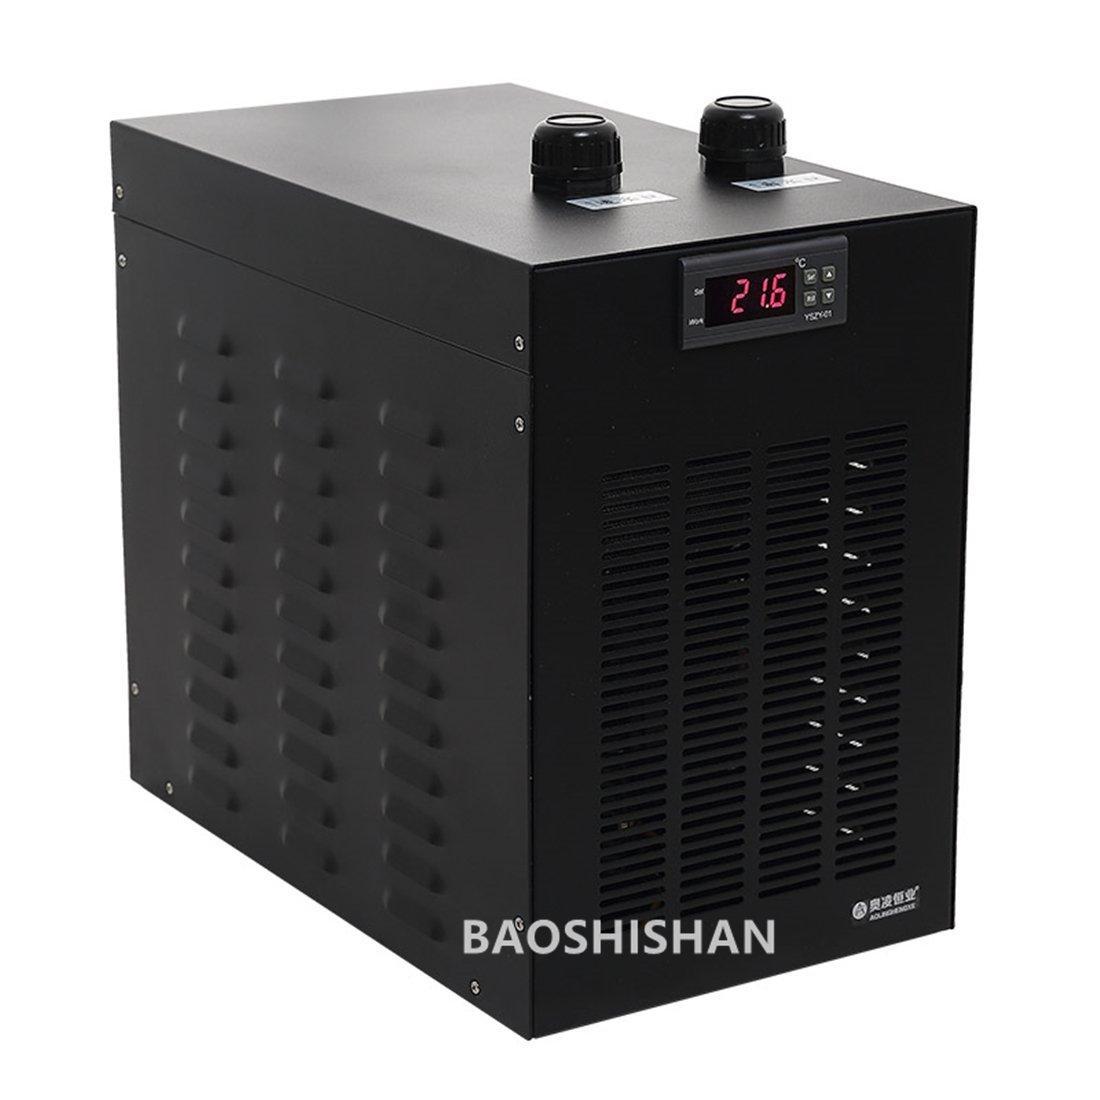 Aquarium Water Cooler Fish Tank Chiller Special Quiet Design Refrigeration Compressor for Waterweeds/Jellyfish/Coral/Crystal Shrimp B0716XSSC4